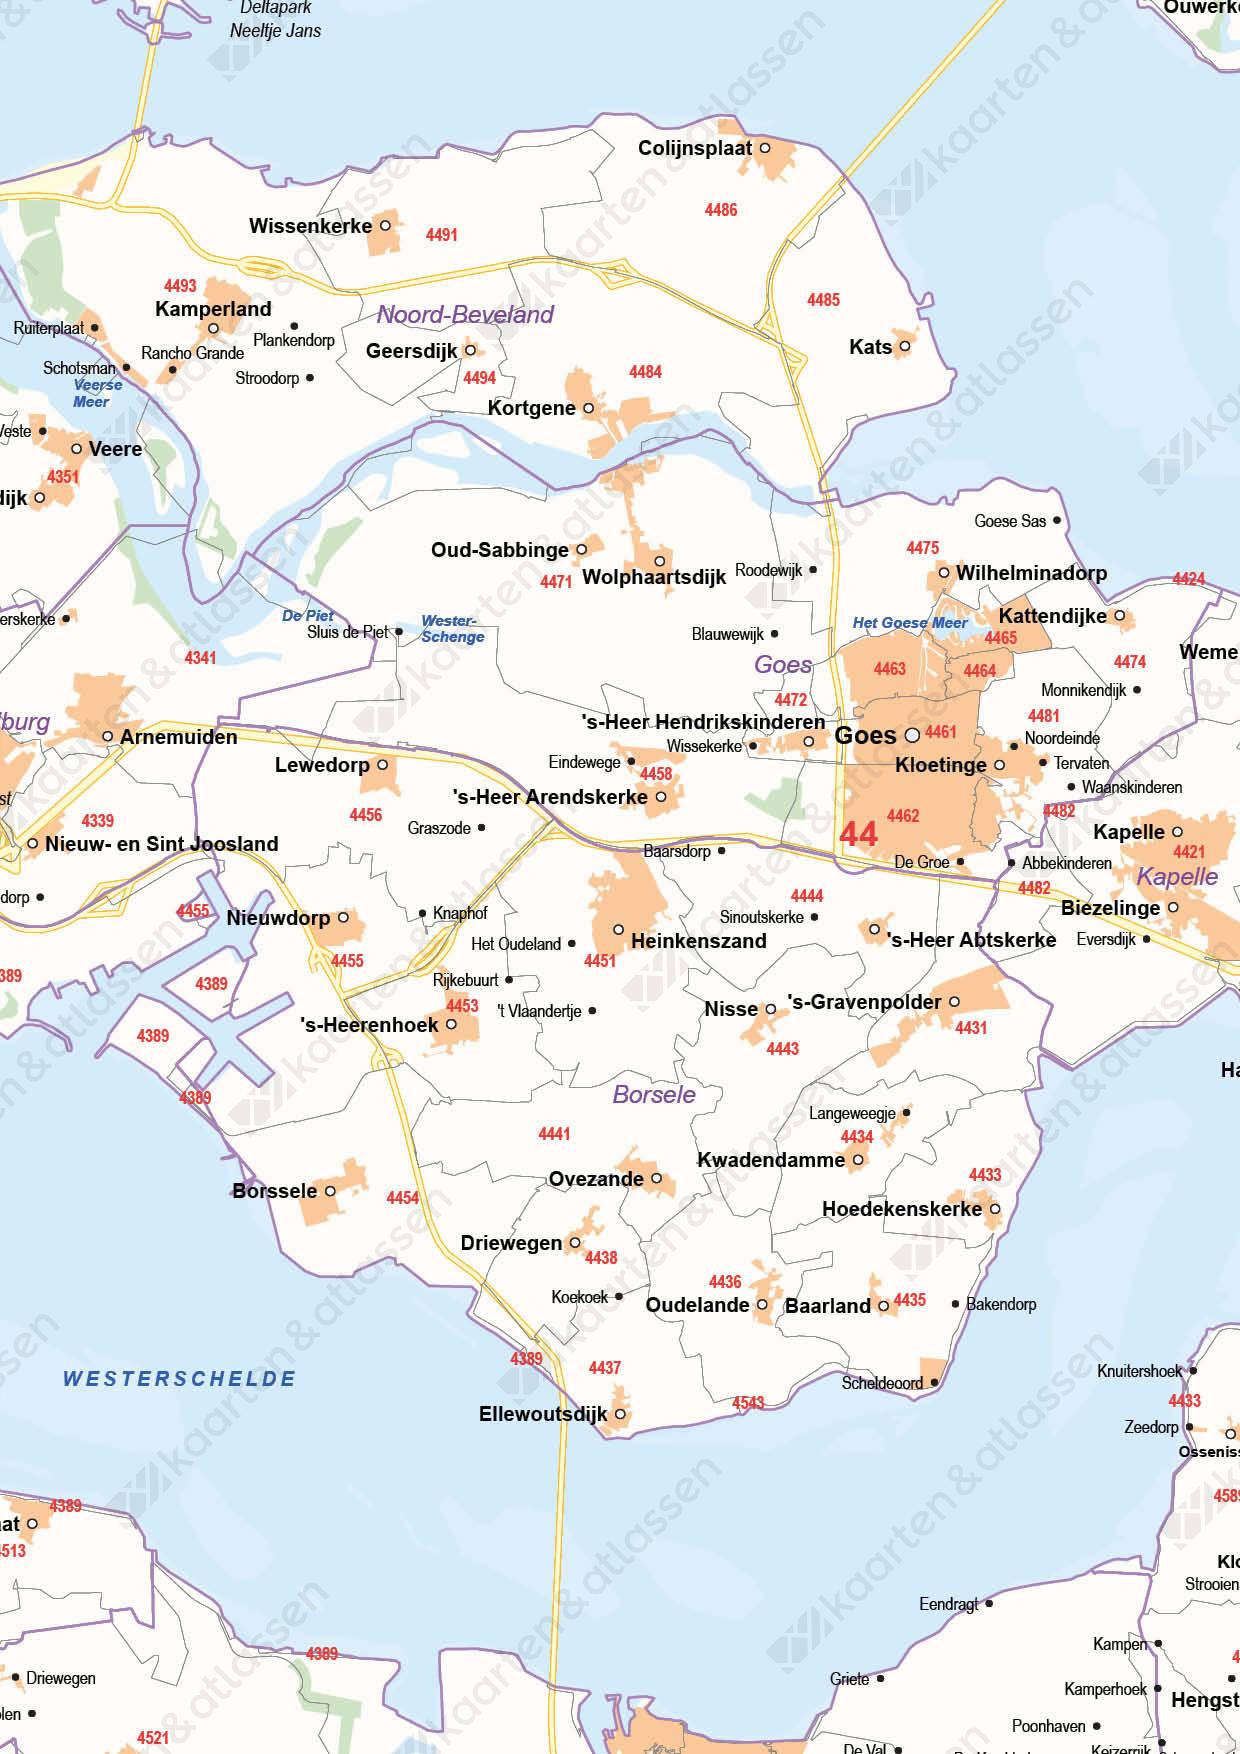 Digitale Postcode-/Gemeentekaart Zeeland